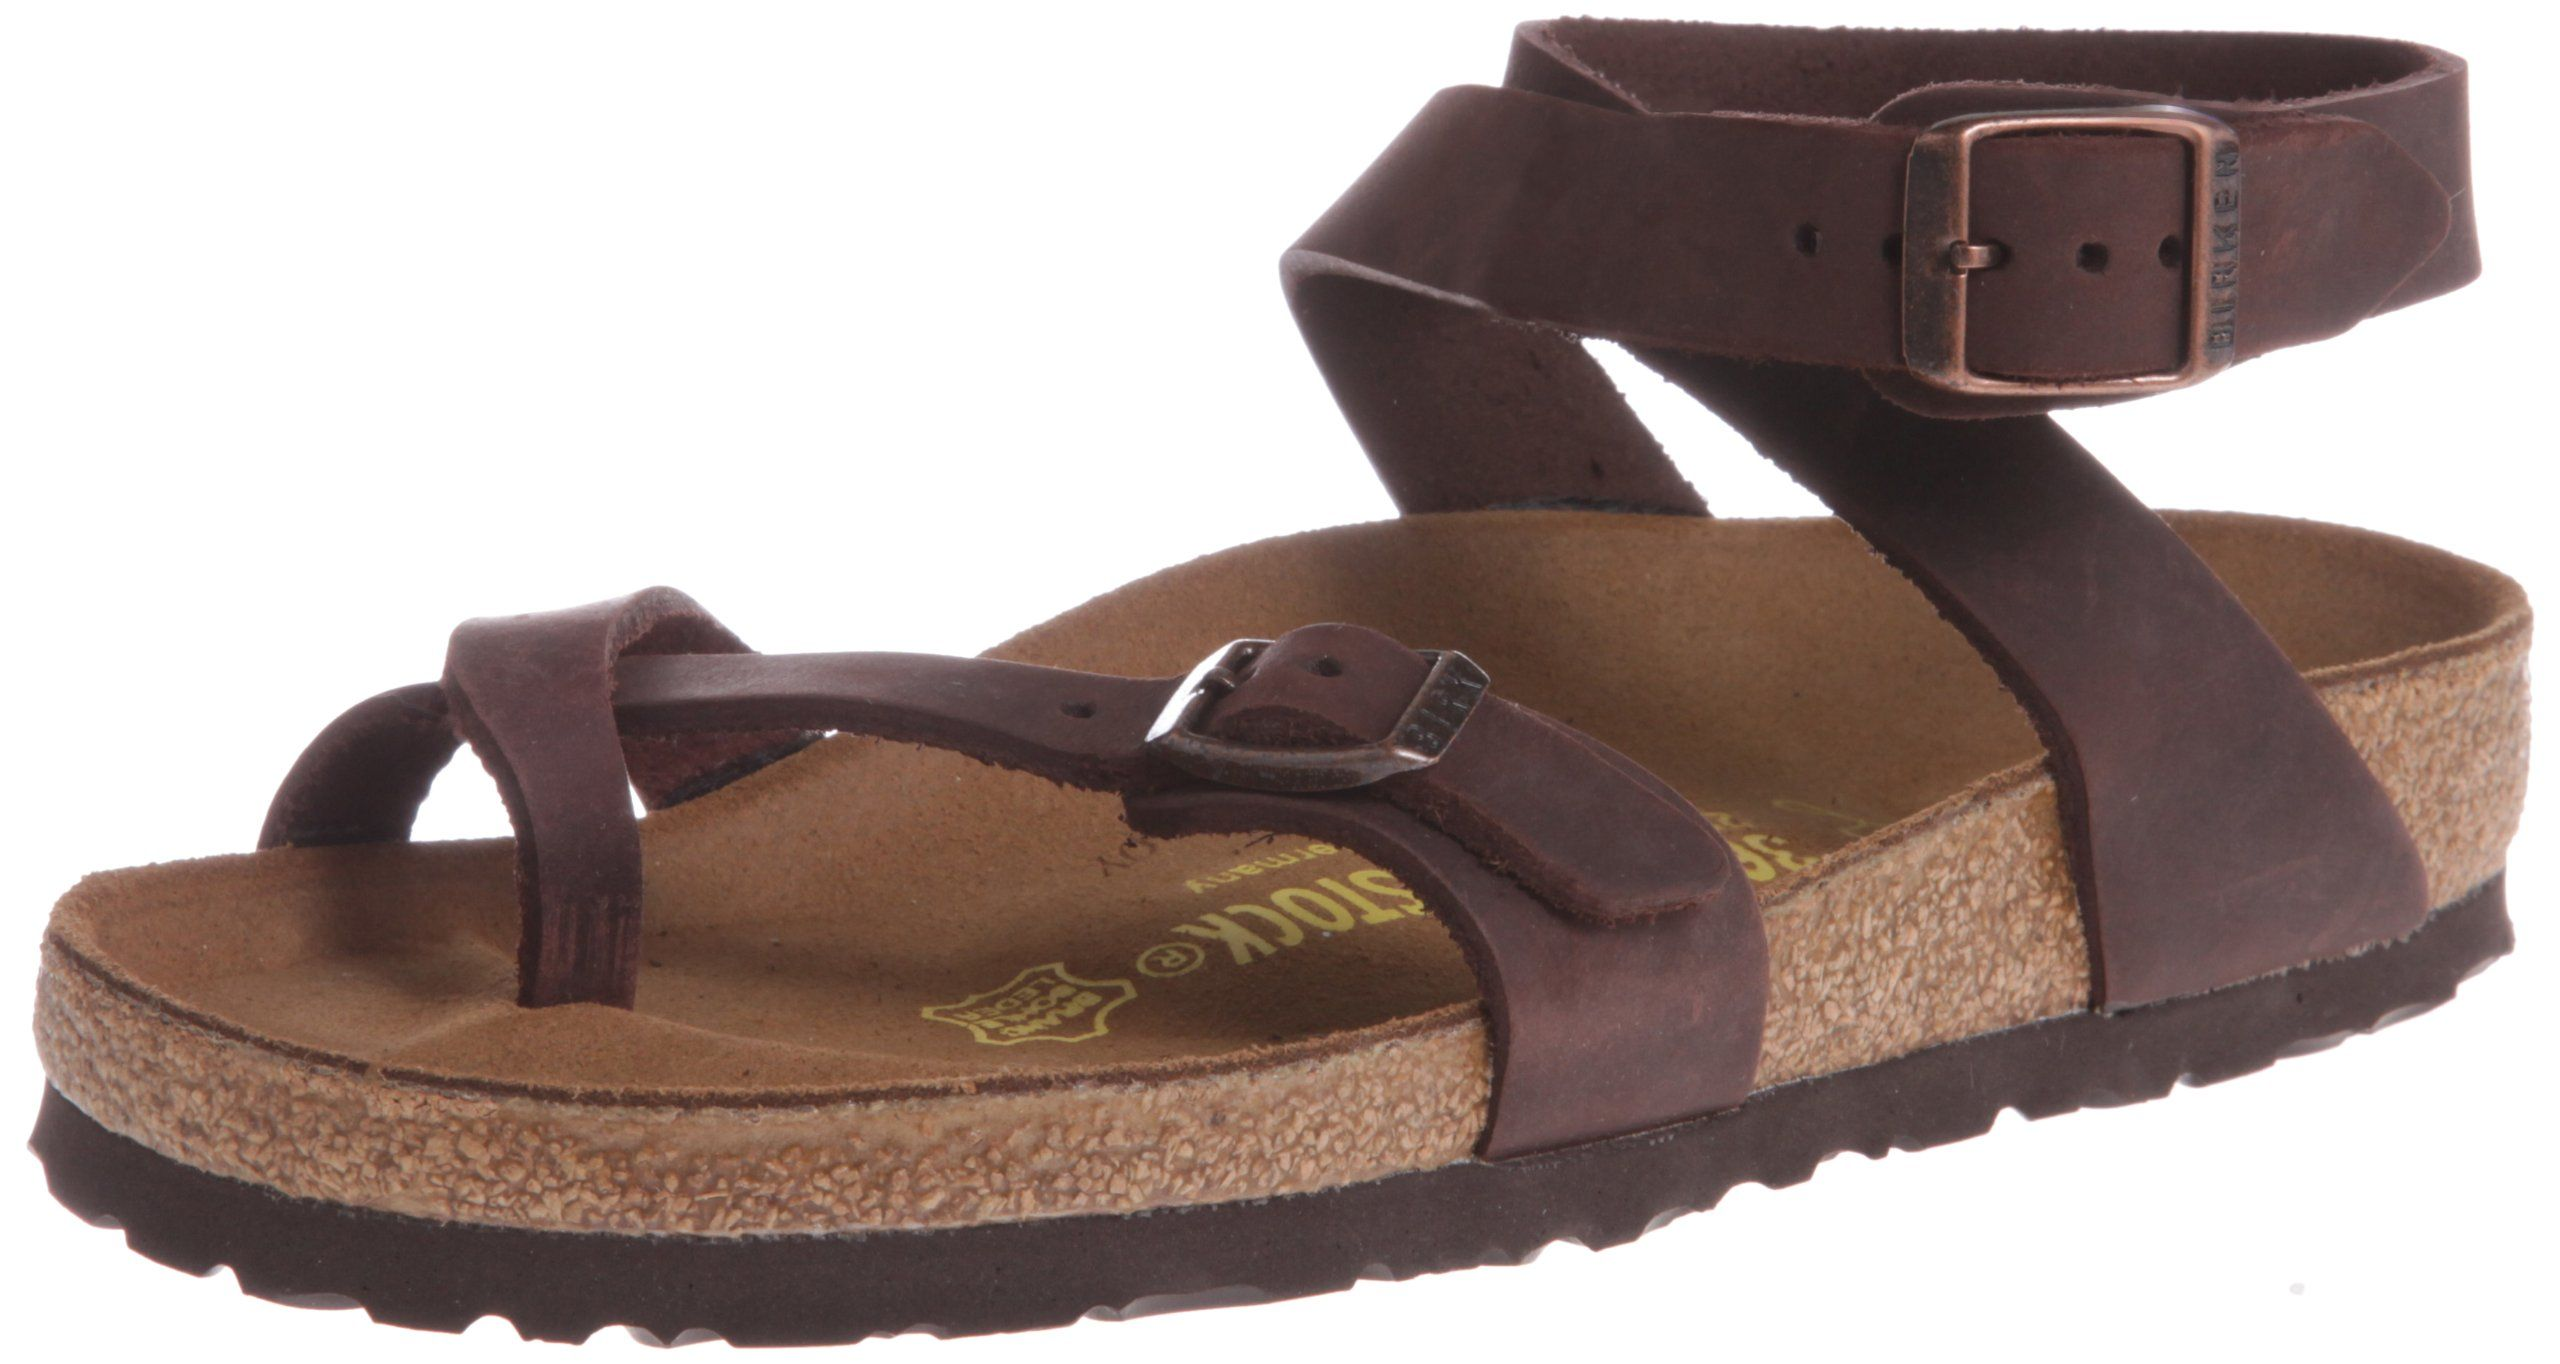 Birkenstock Arizona Slim Leather White, Schuhe, Sandalen & Hausschuhe, Sandalen, Braun, Female, 35